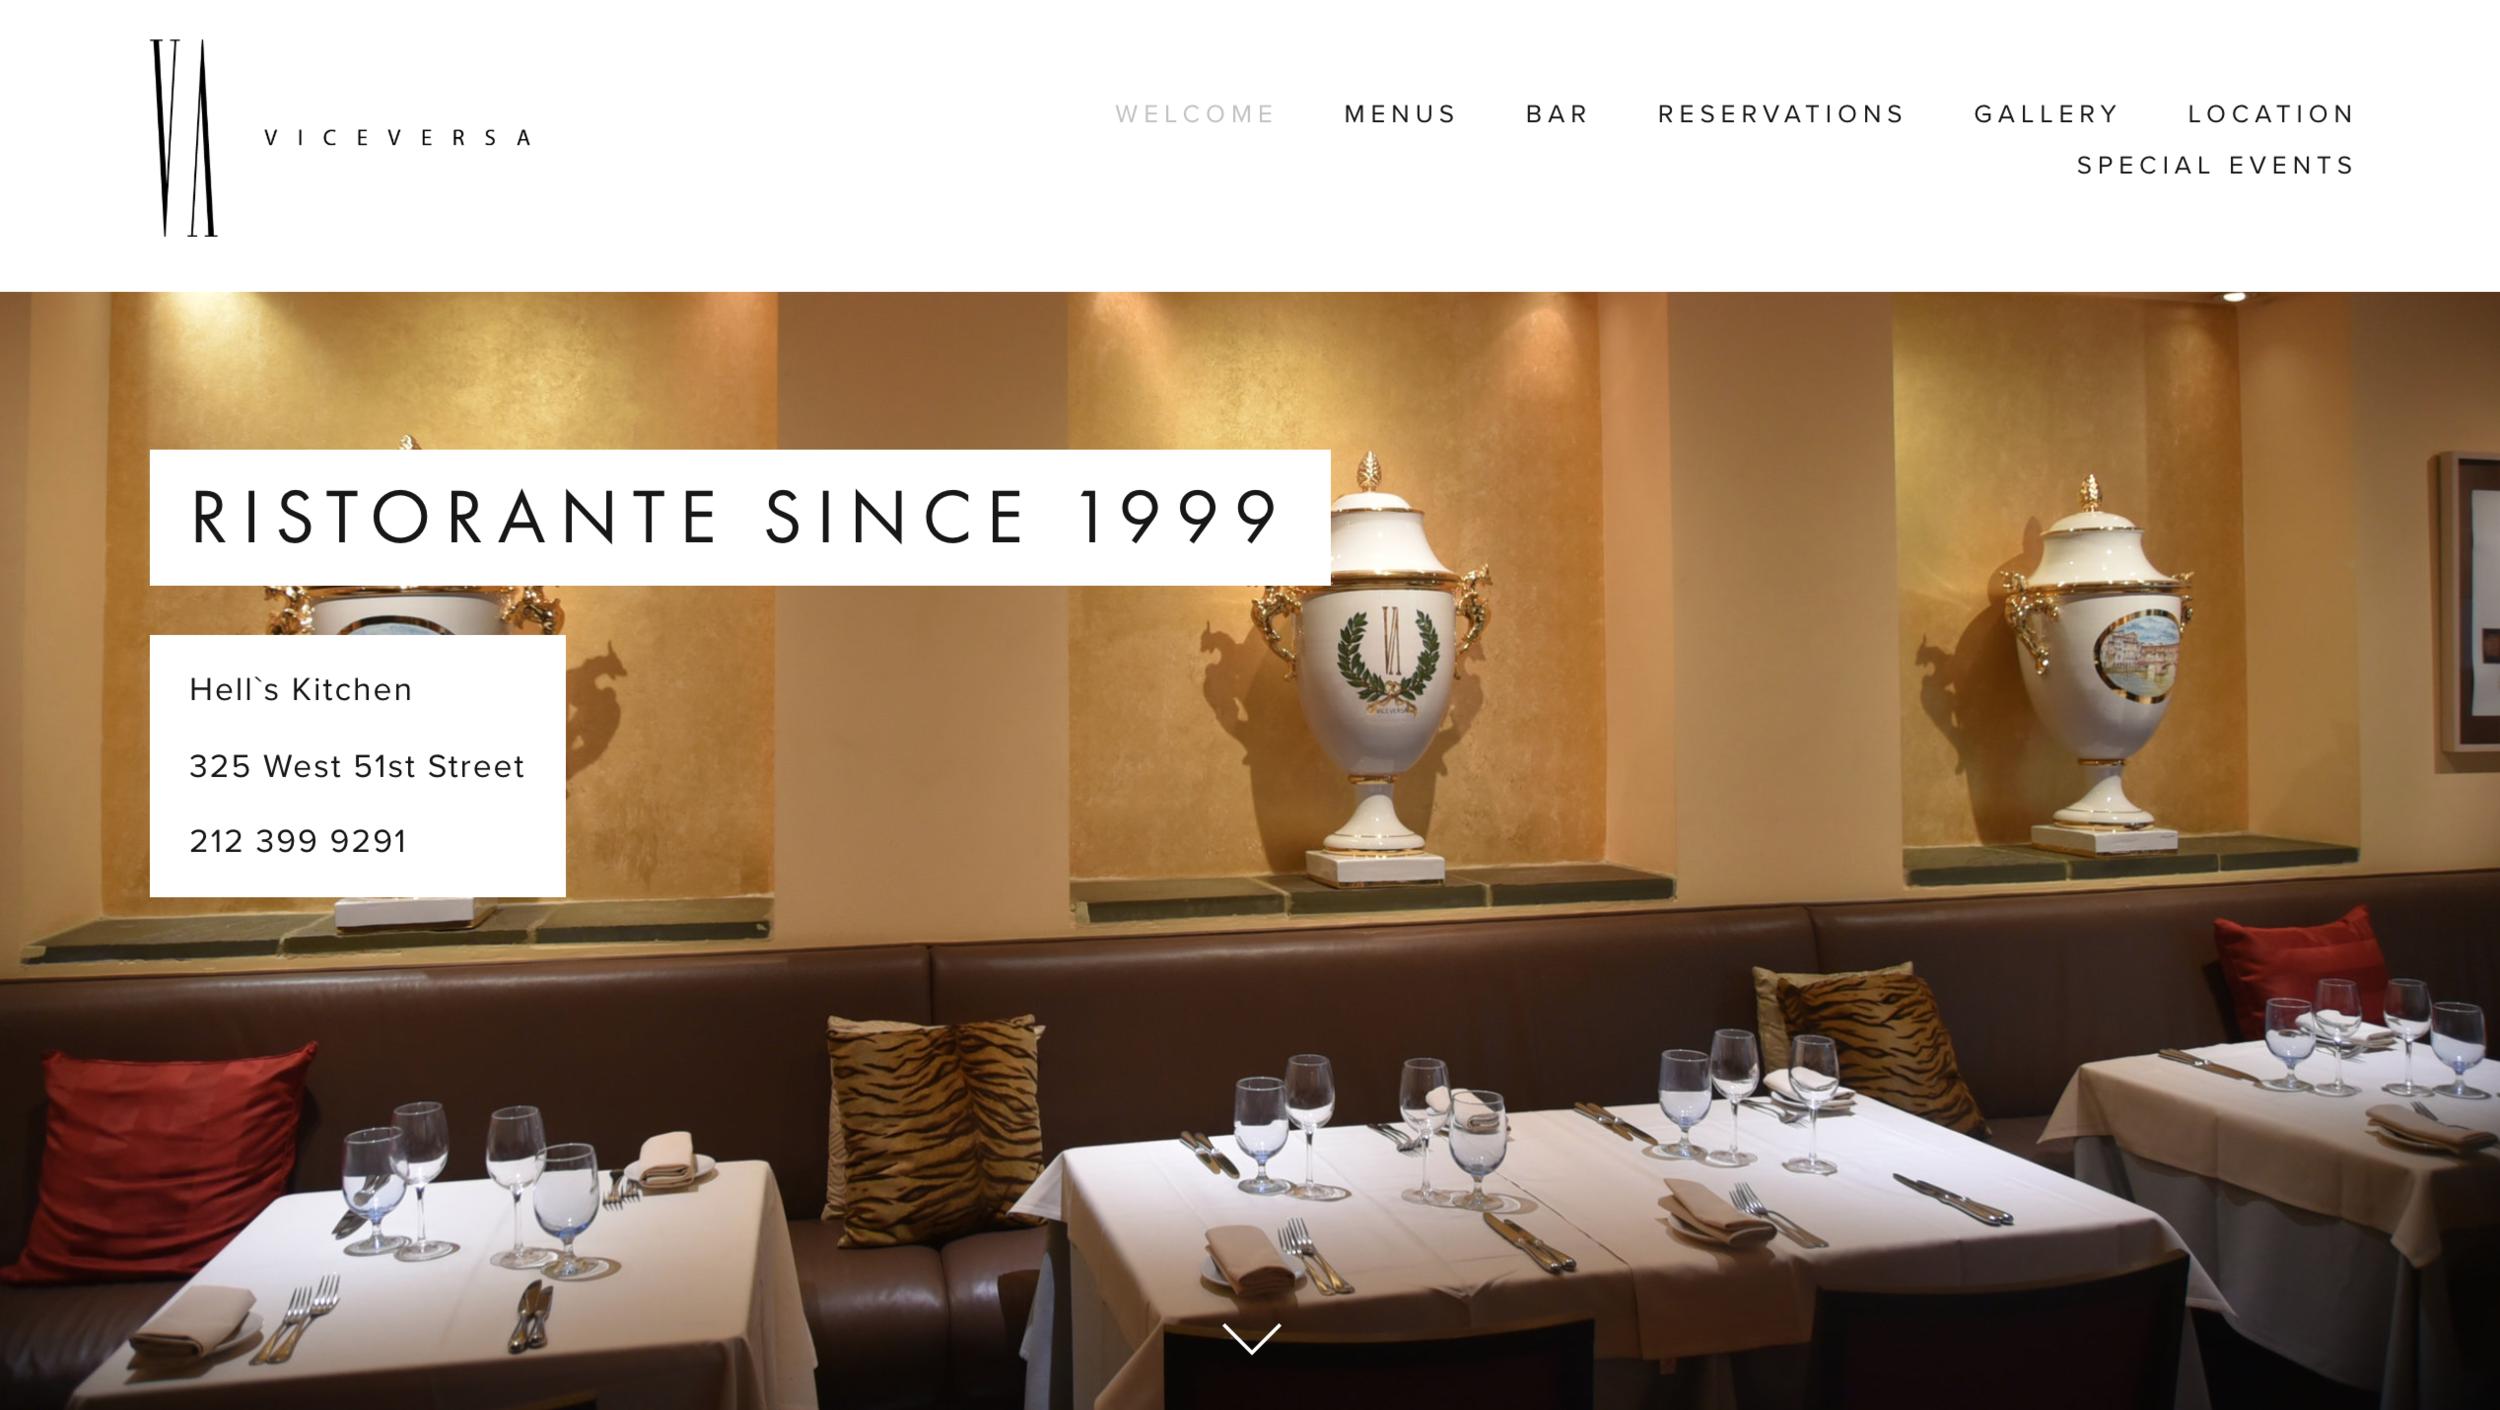 Viveversa Ristorante Website